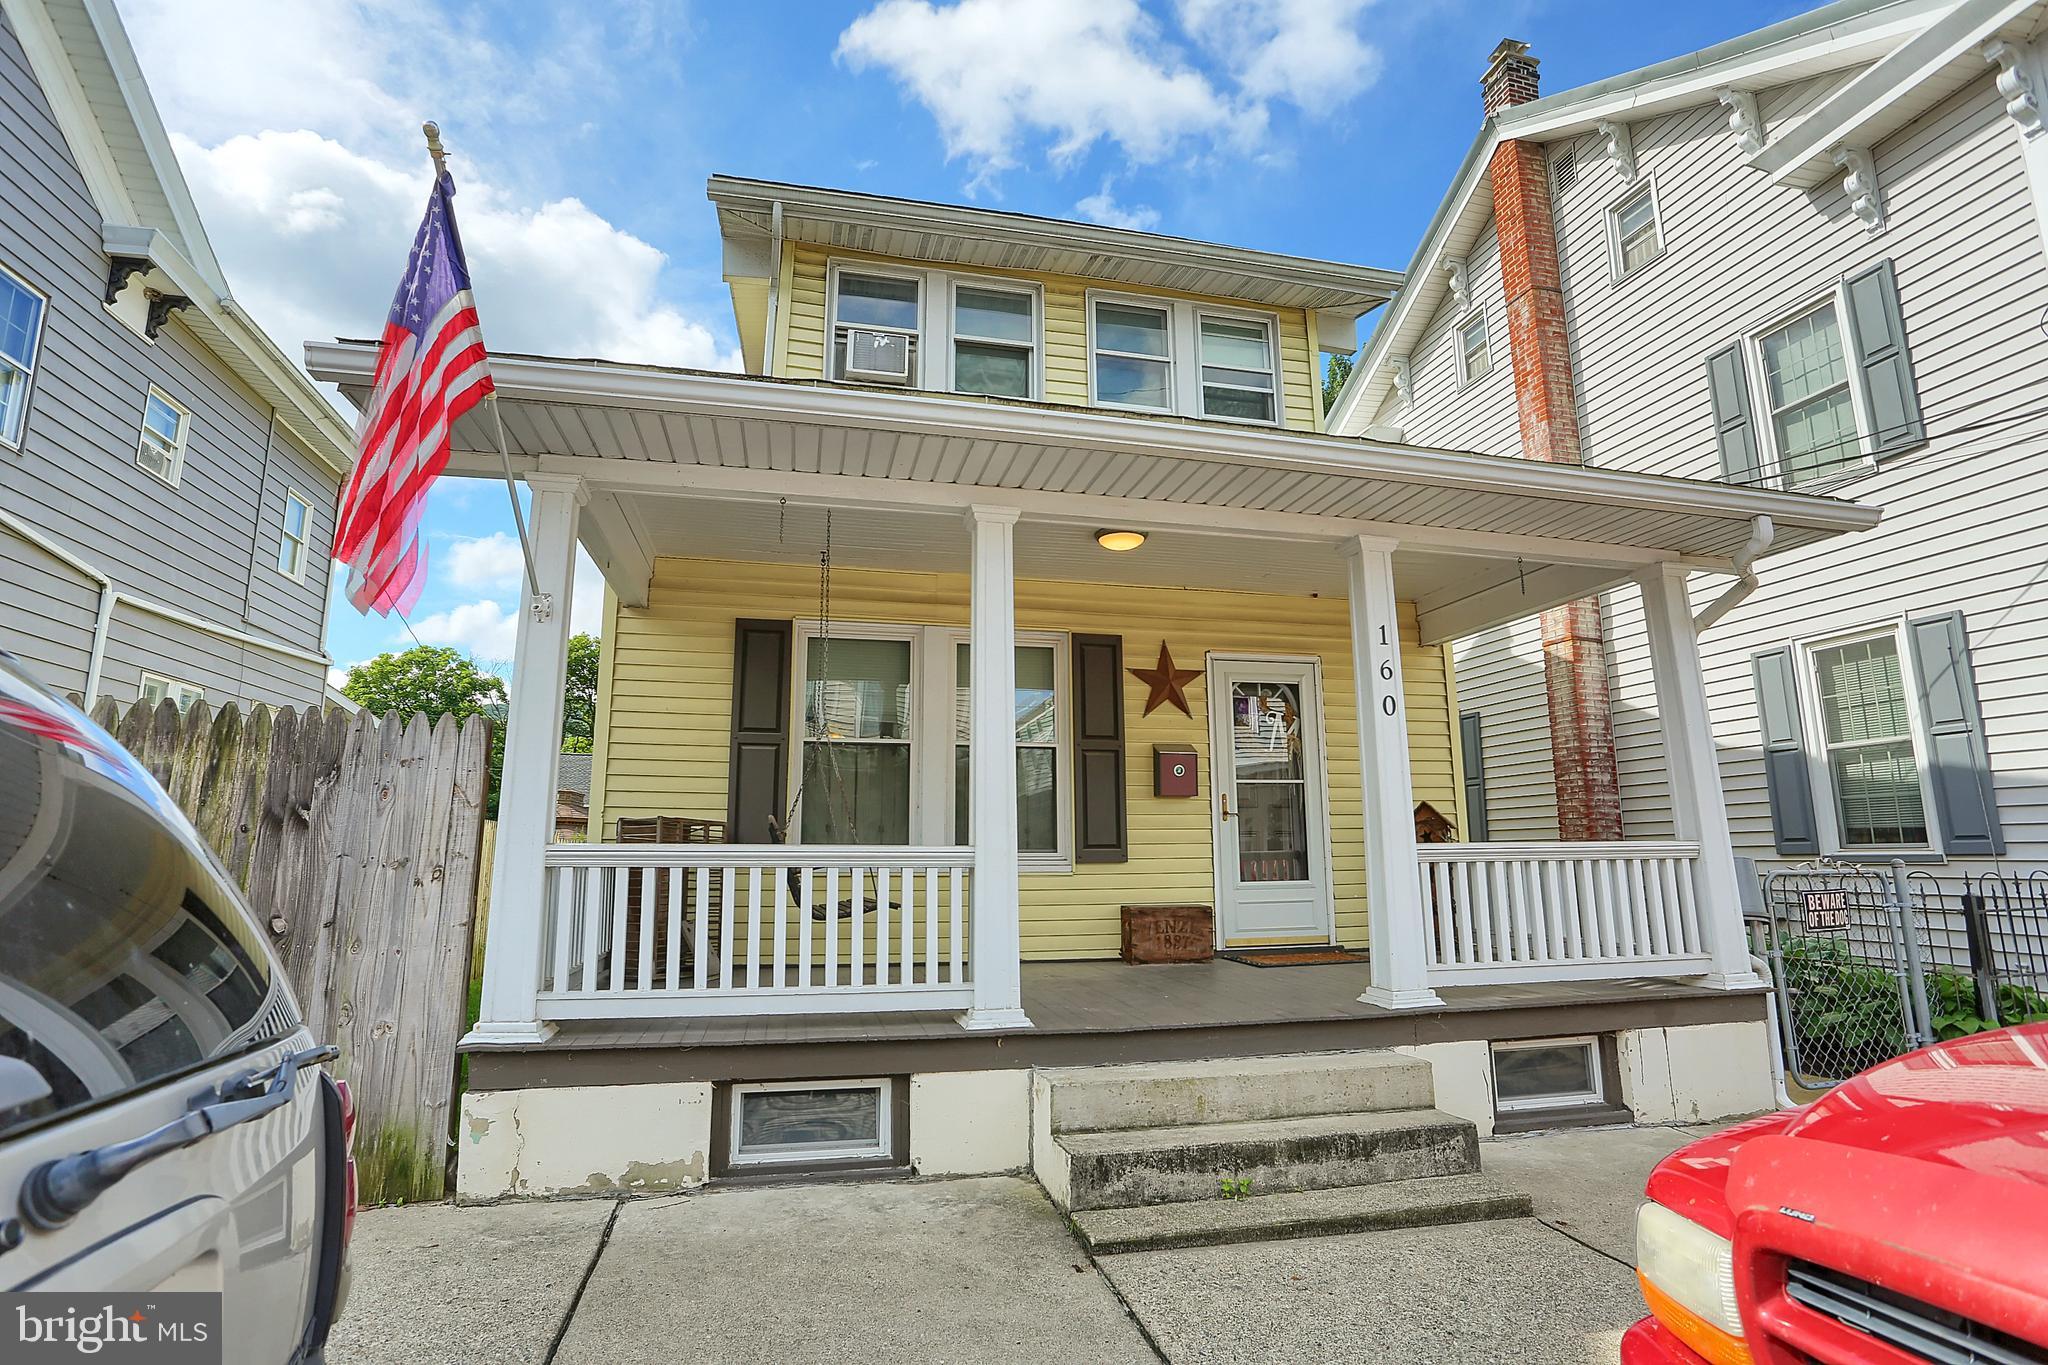 160 PINE STREET, MILLERSBURG, PA 17061